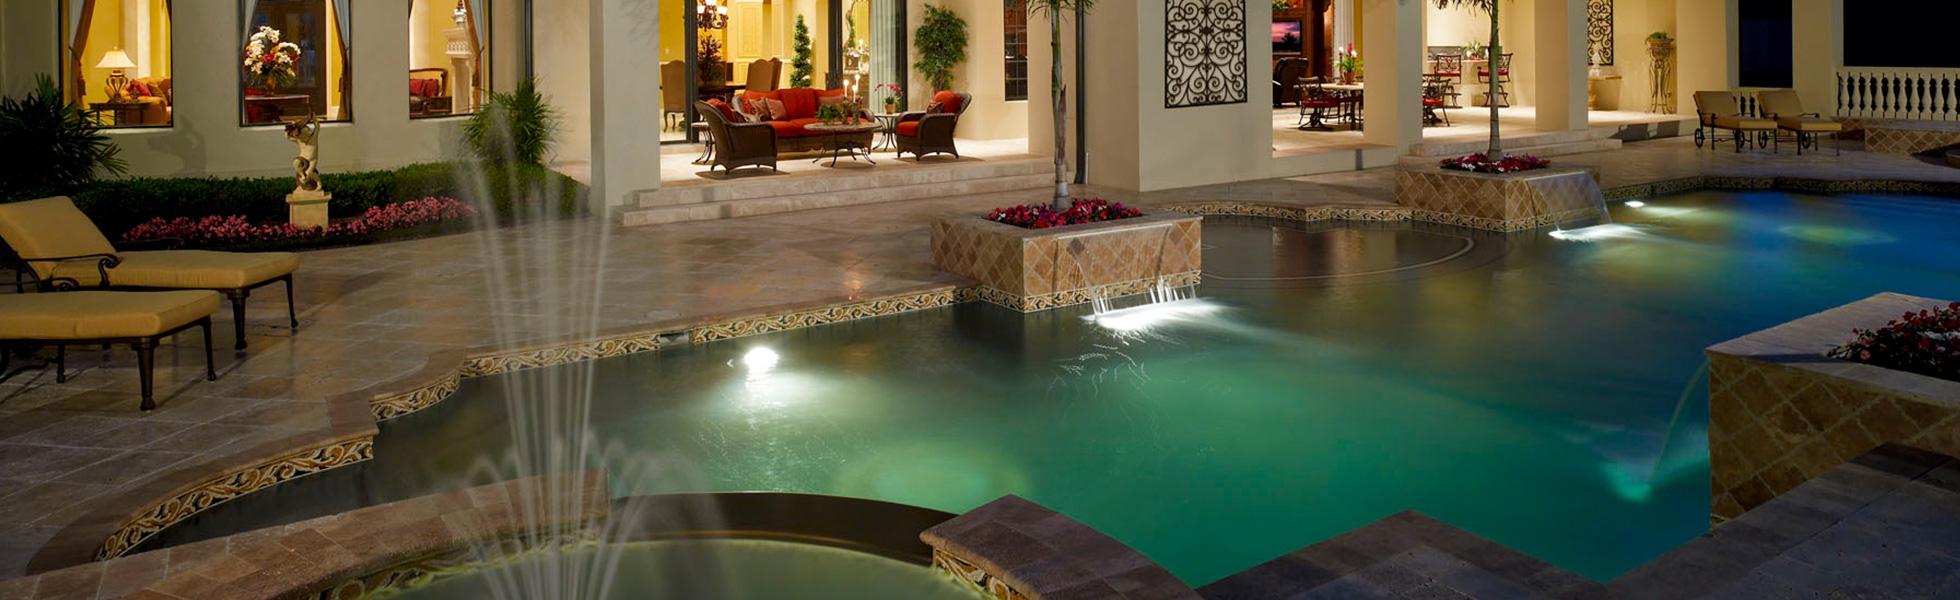 Orlando Luxury Pool Builder